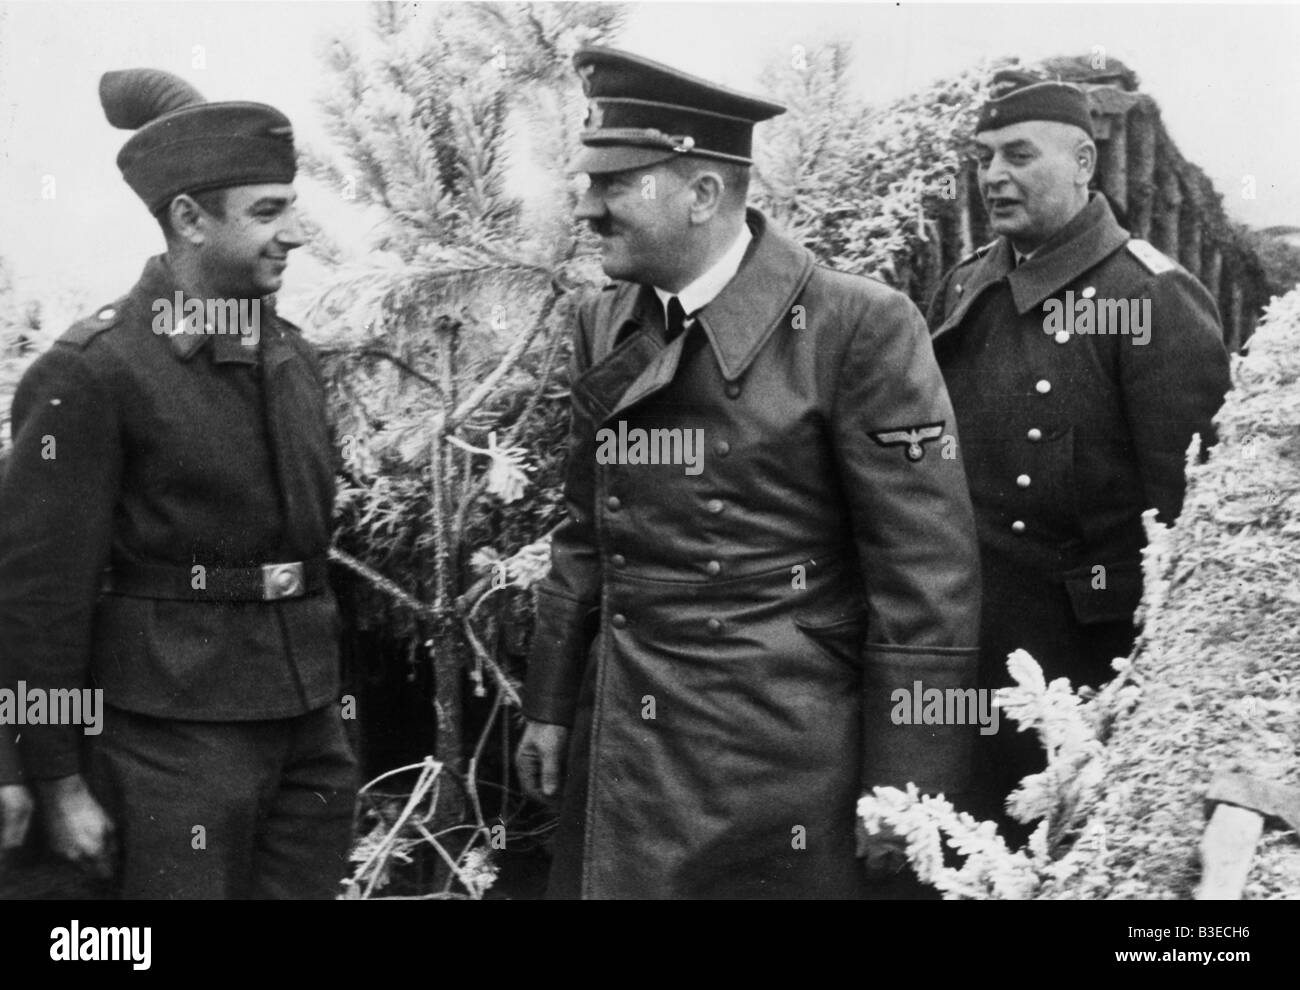 Adolf Hitler in Anti-aircraft gun positi Stock Photo